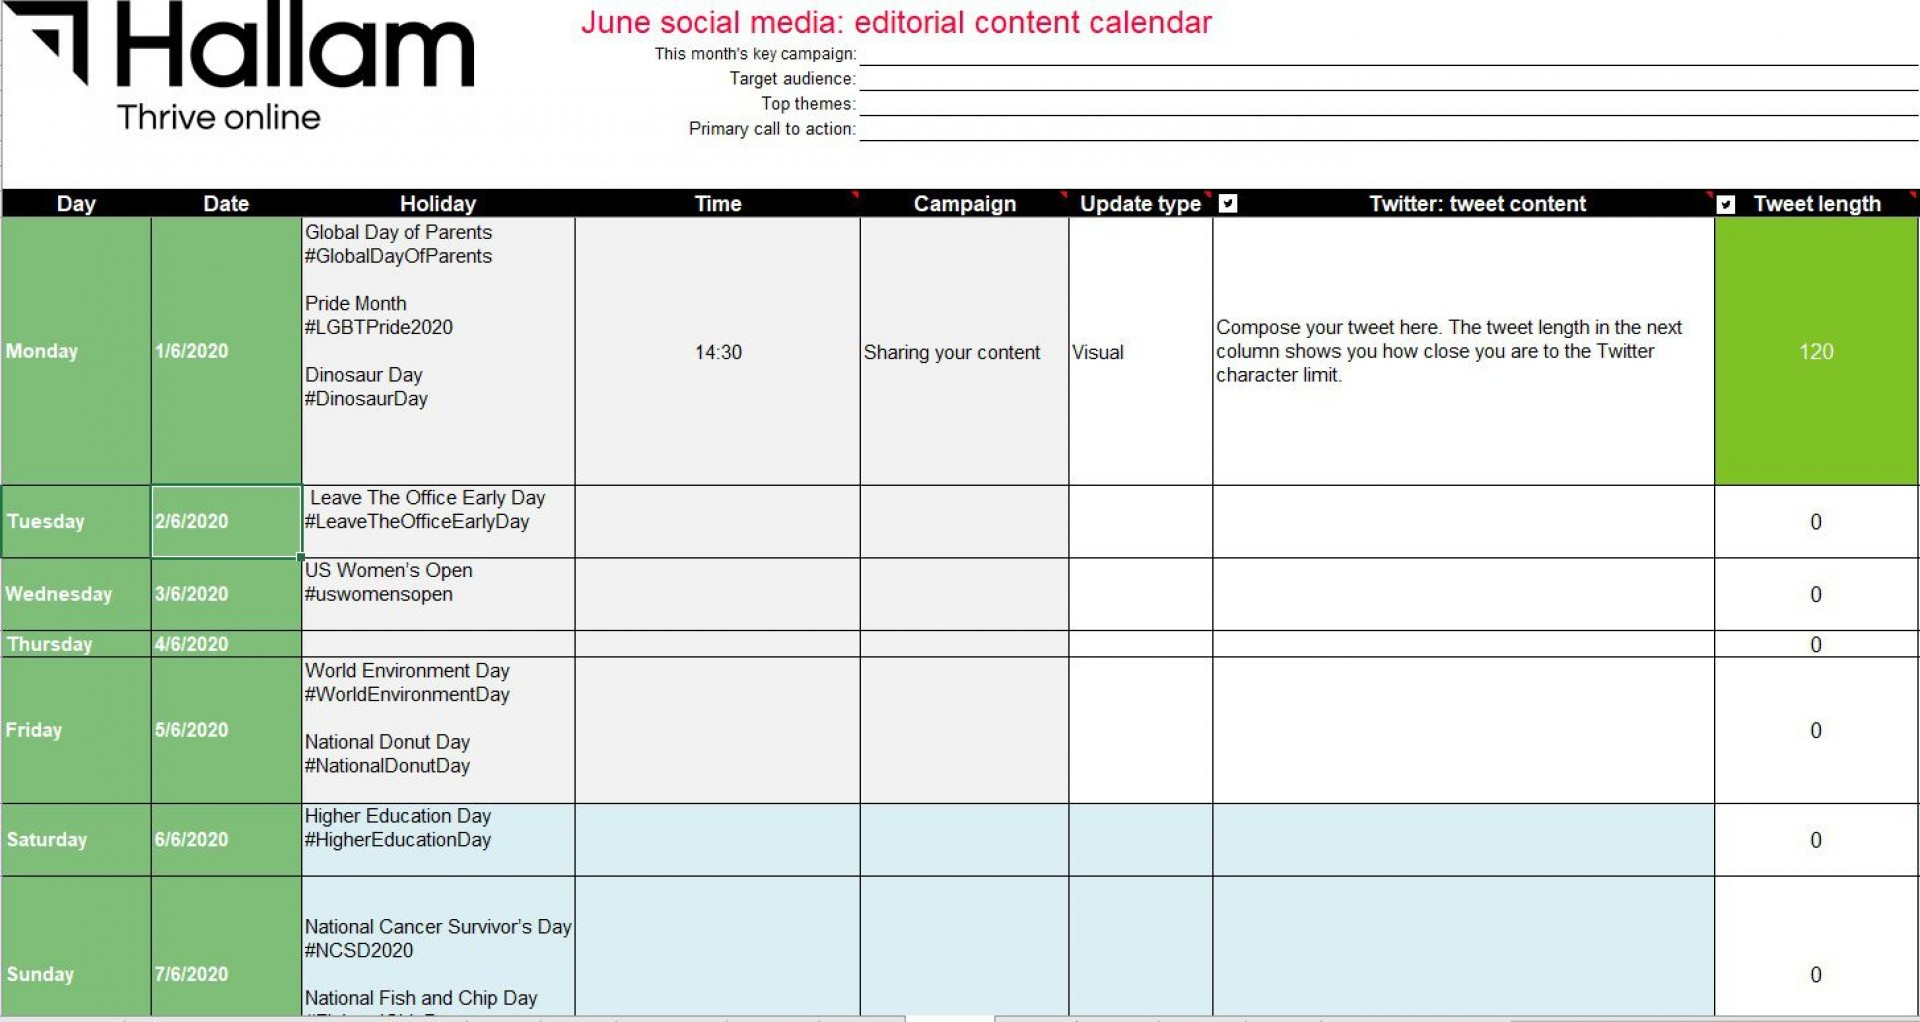 009 Imposing Social Media Editorial Calendar Template Concept  Content Excel 2020 Free Download1920